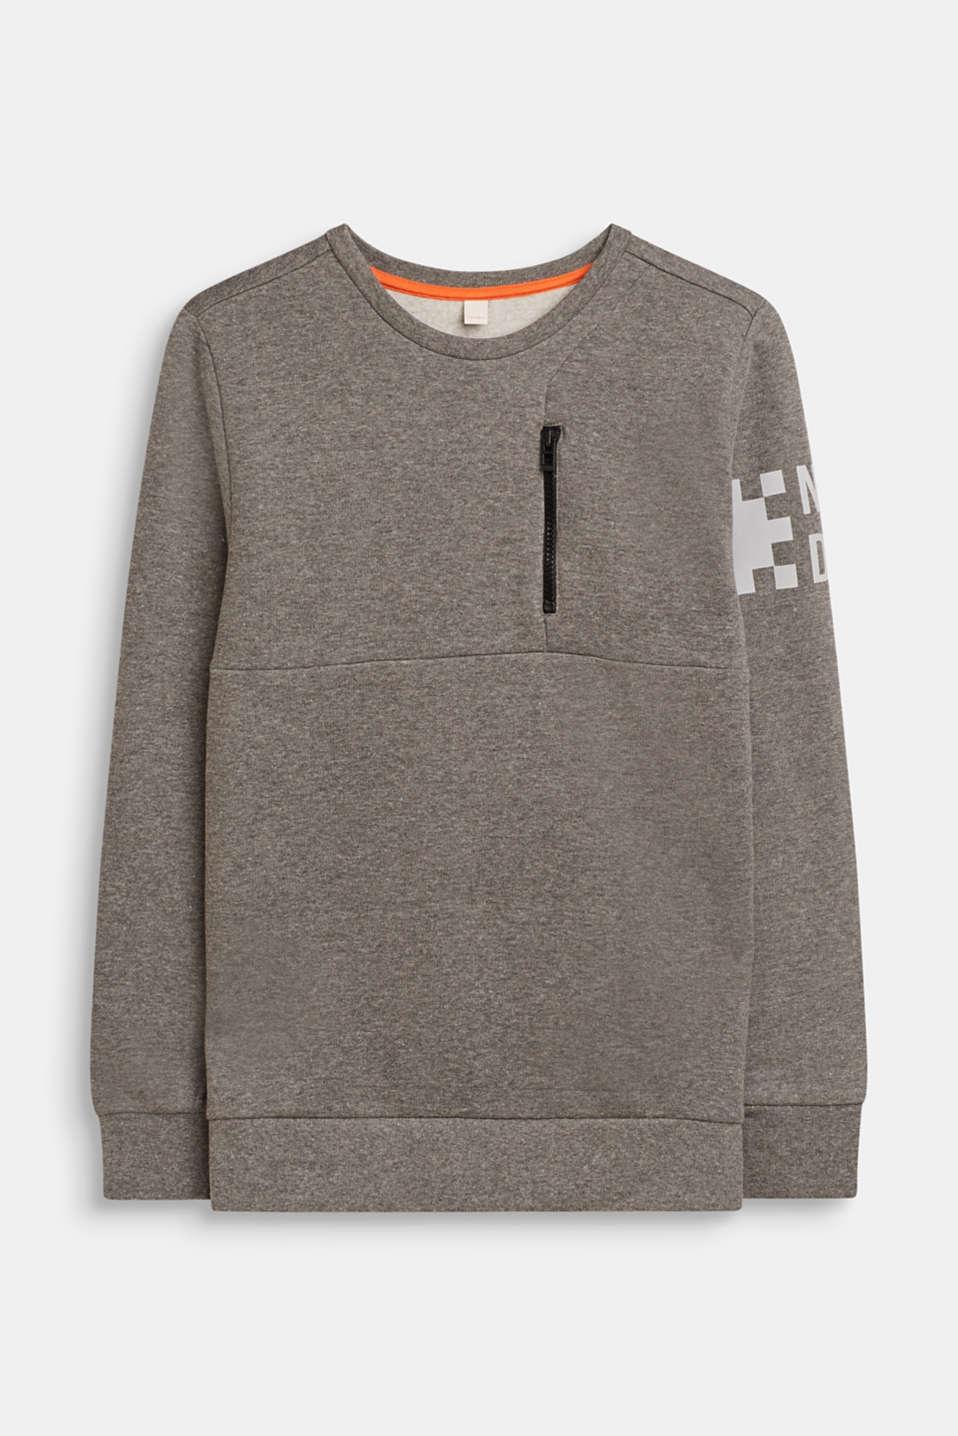 Sweatshirt with print and a zip detail, LCDARK HEATHER G, detail image number 0